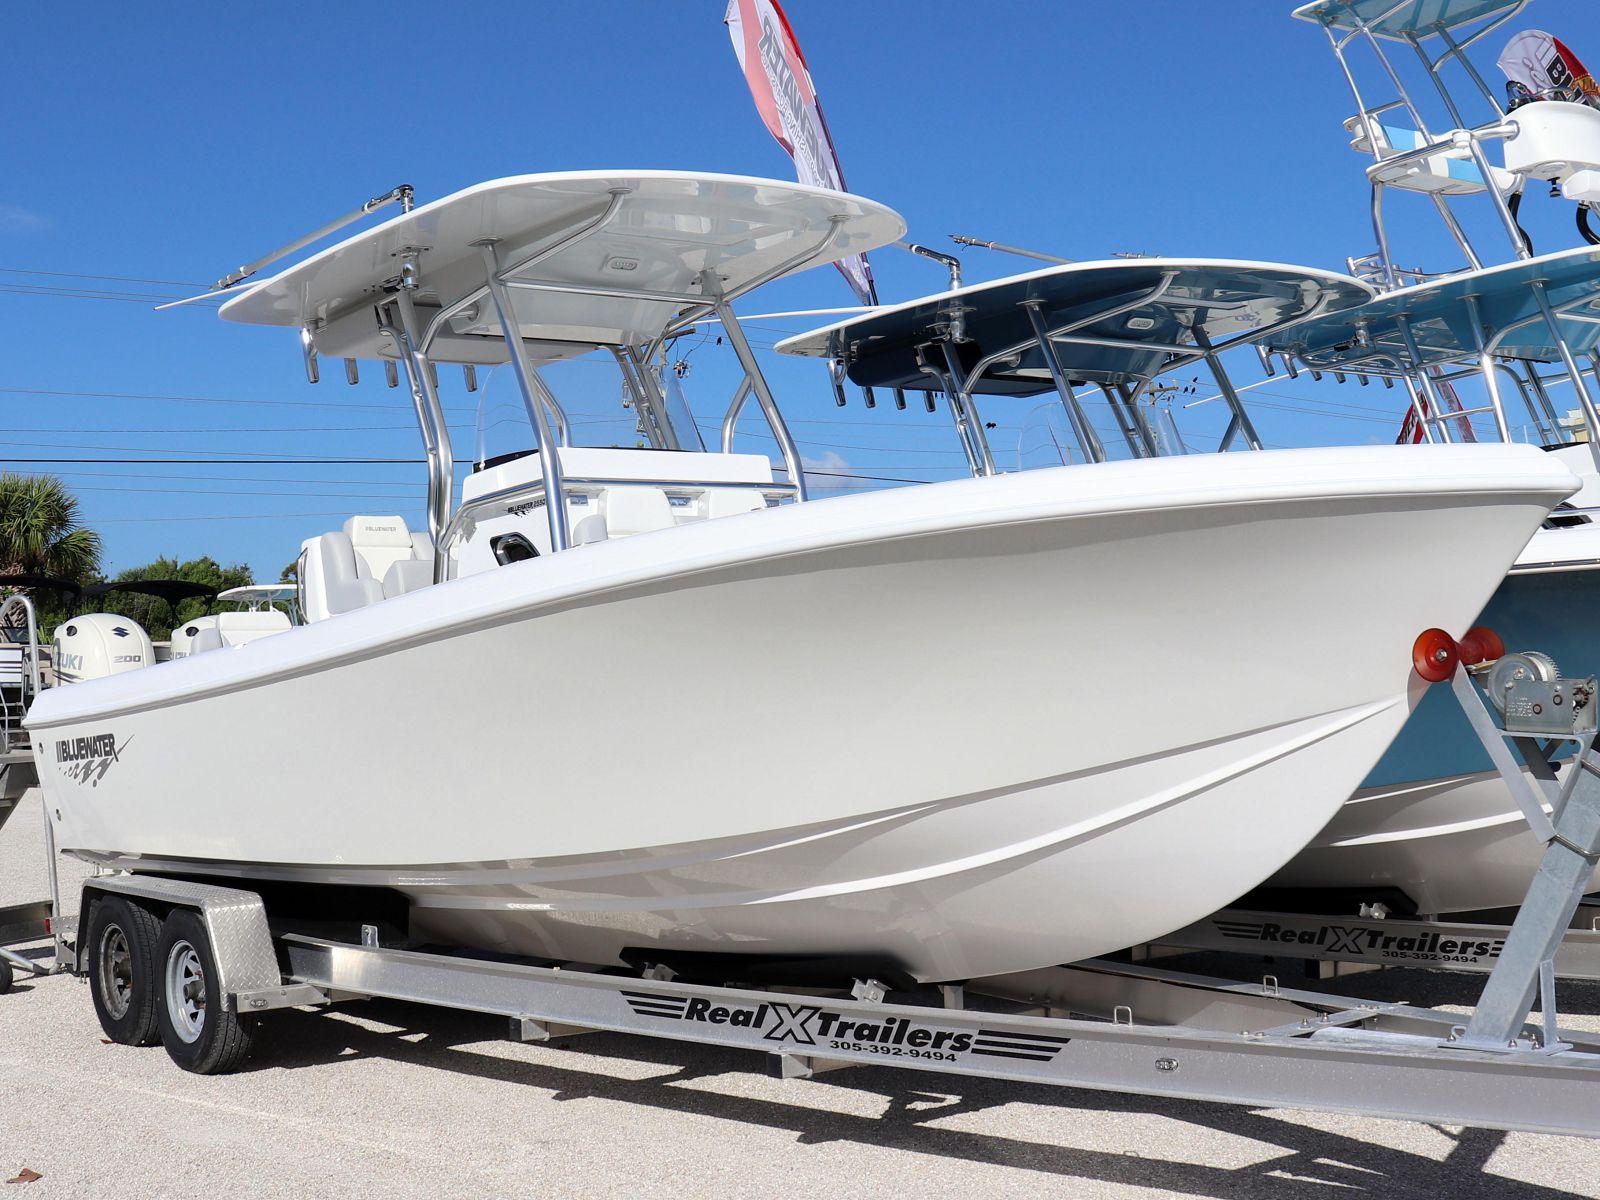 2019 Bluewater Sportfishing Boats 28 Jupiter Pointe